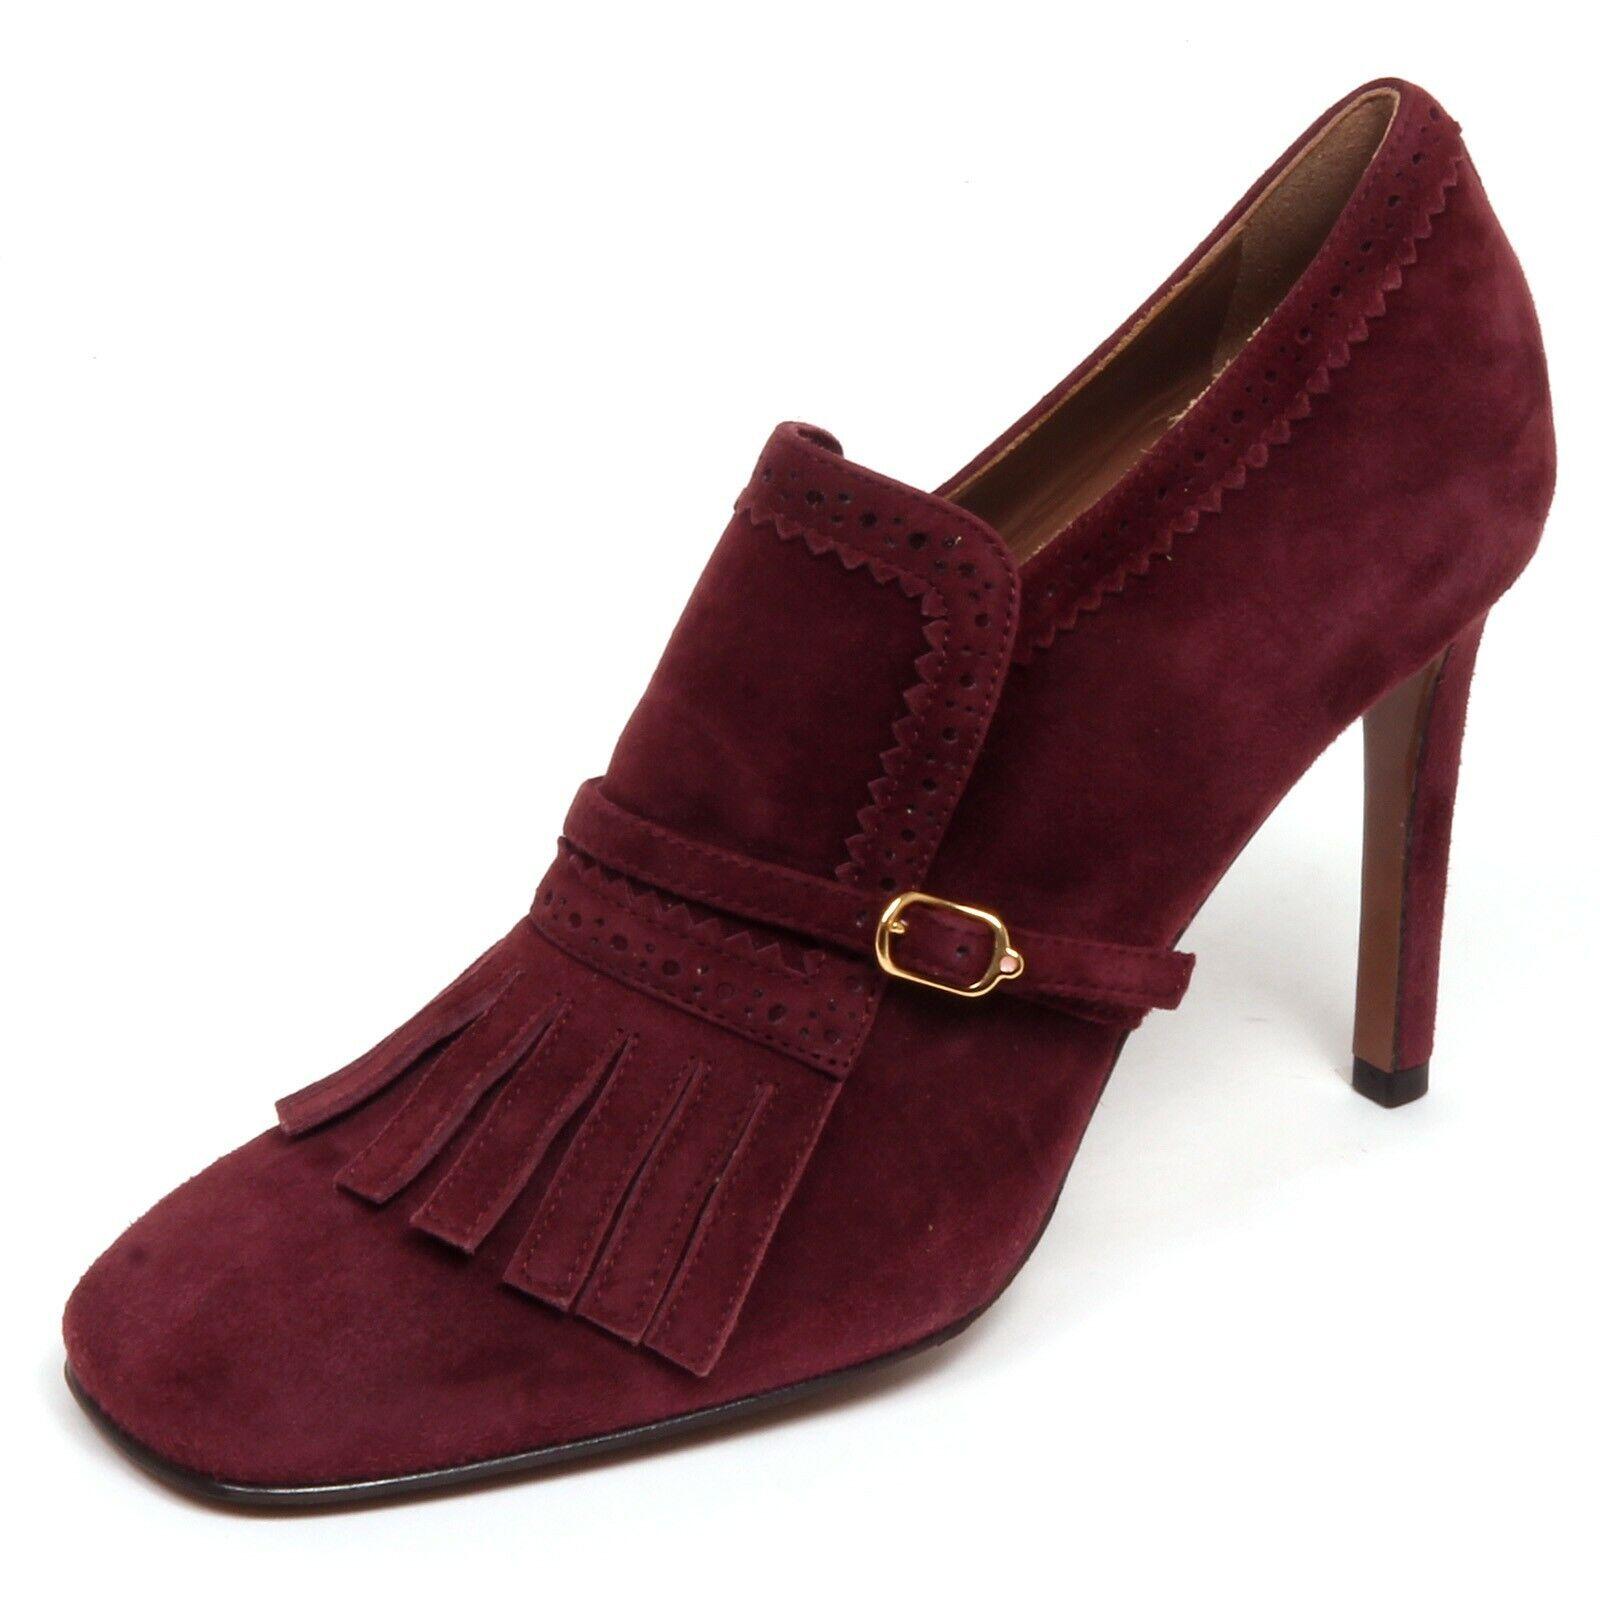 F6296 Decoletage kvinnor Bordeaux I 'autre Chose skor skor skor mocka skor kvinna  presentera alla senaste high street mode